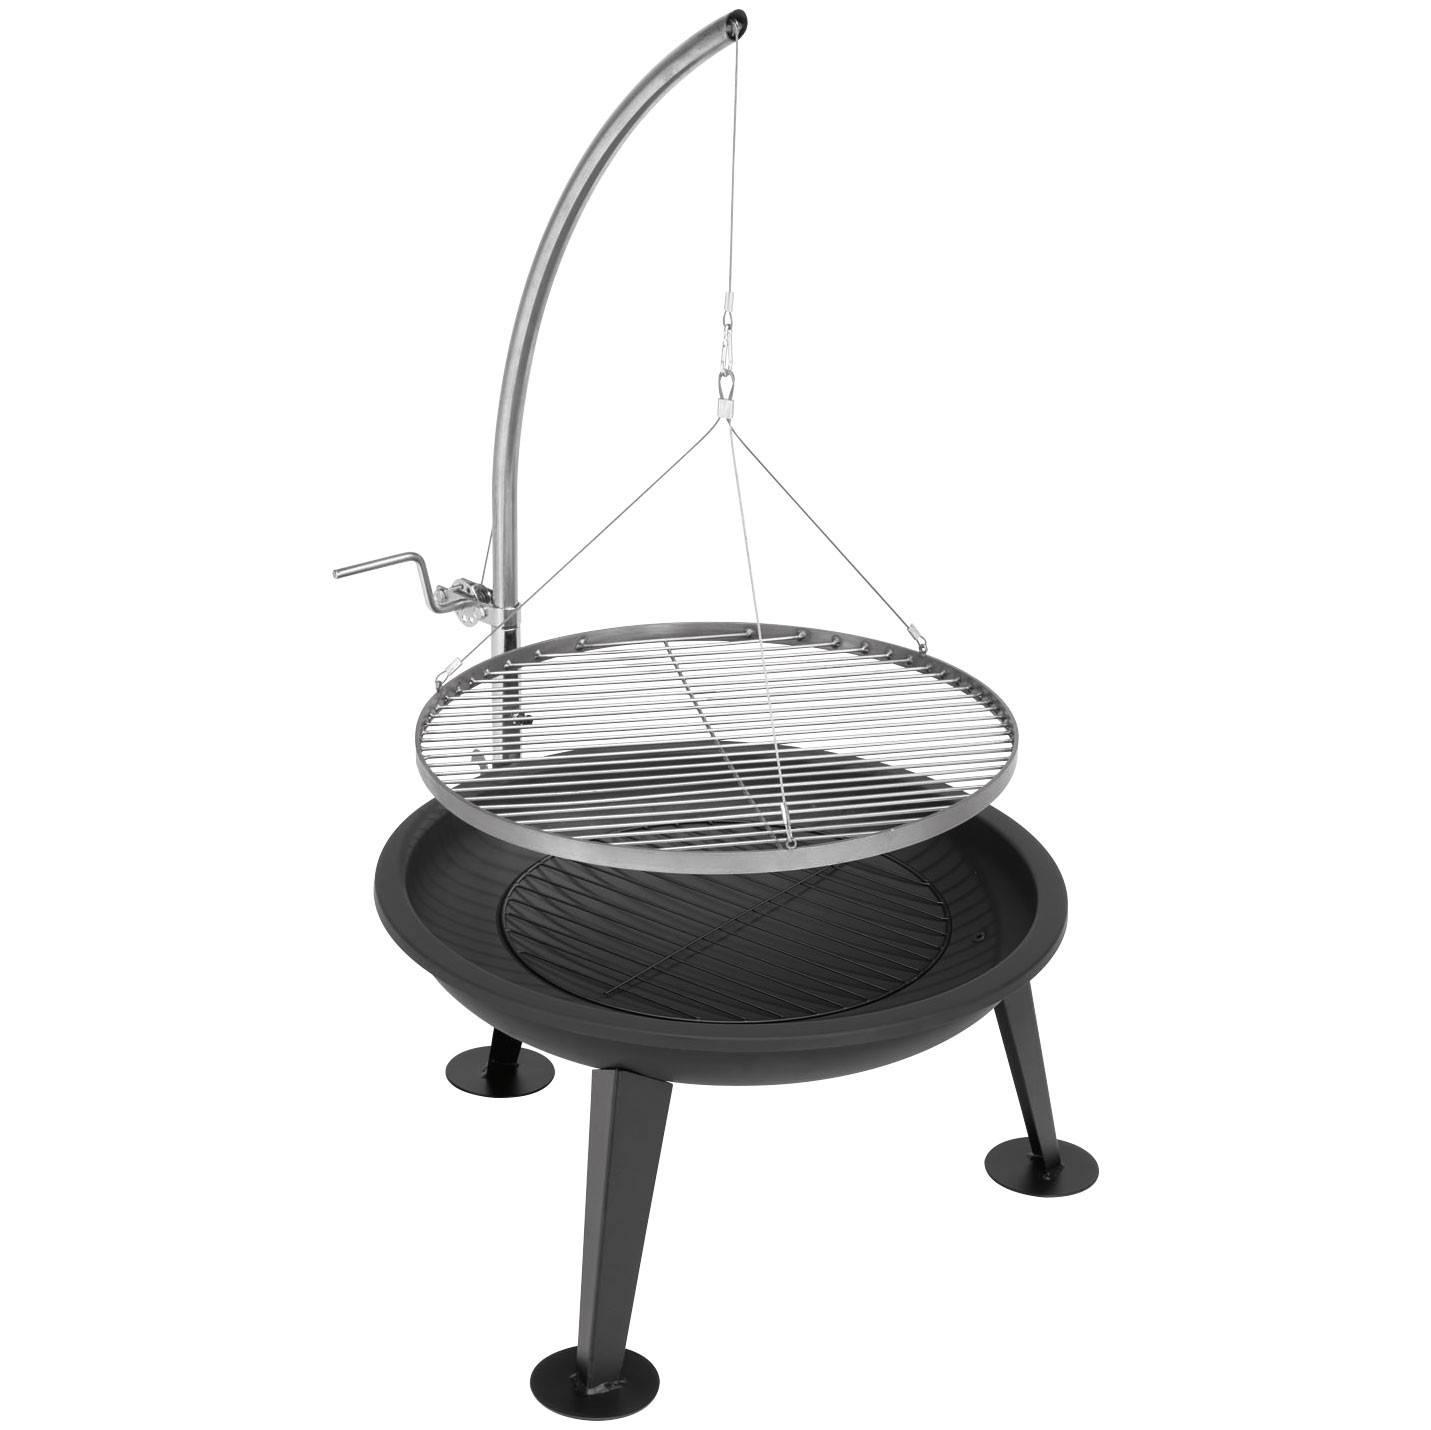 justus feuerschale schwenkgrill narziss. Black Bedroom Furniture Sets. Home Design Ideas